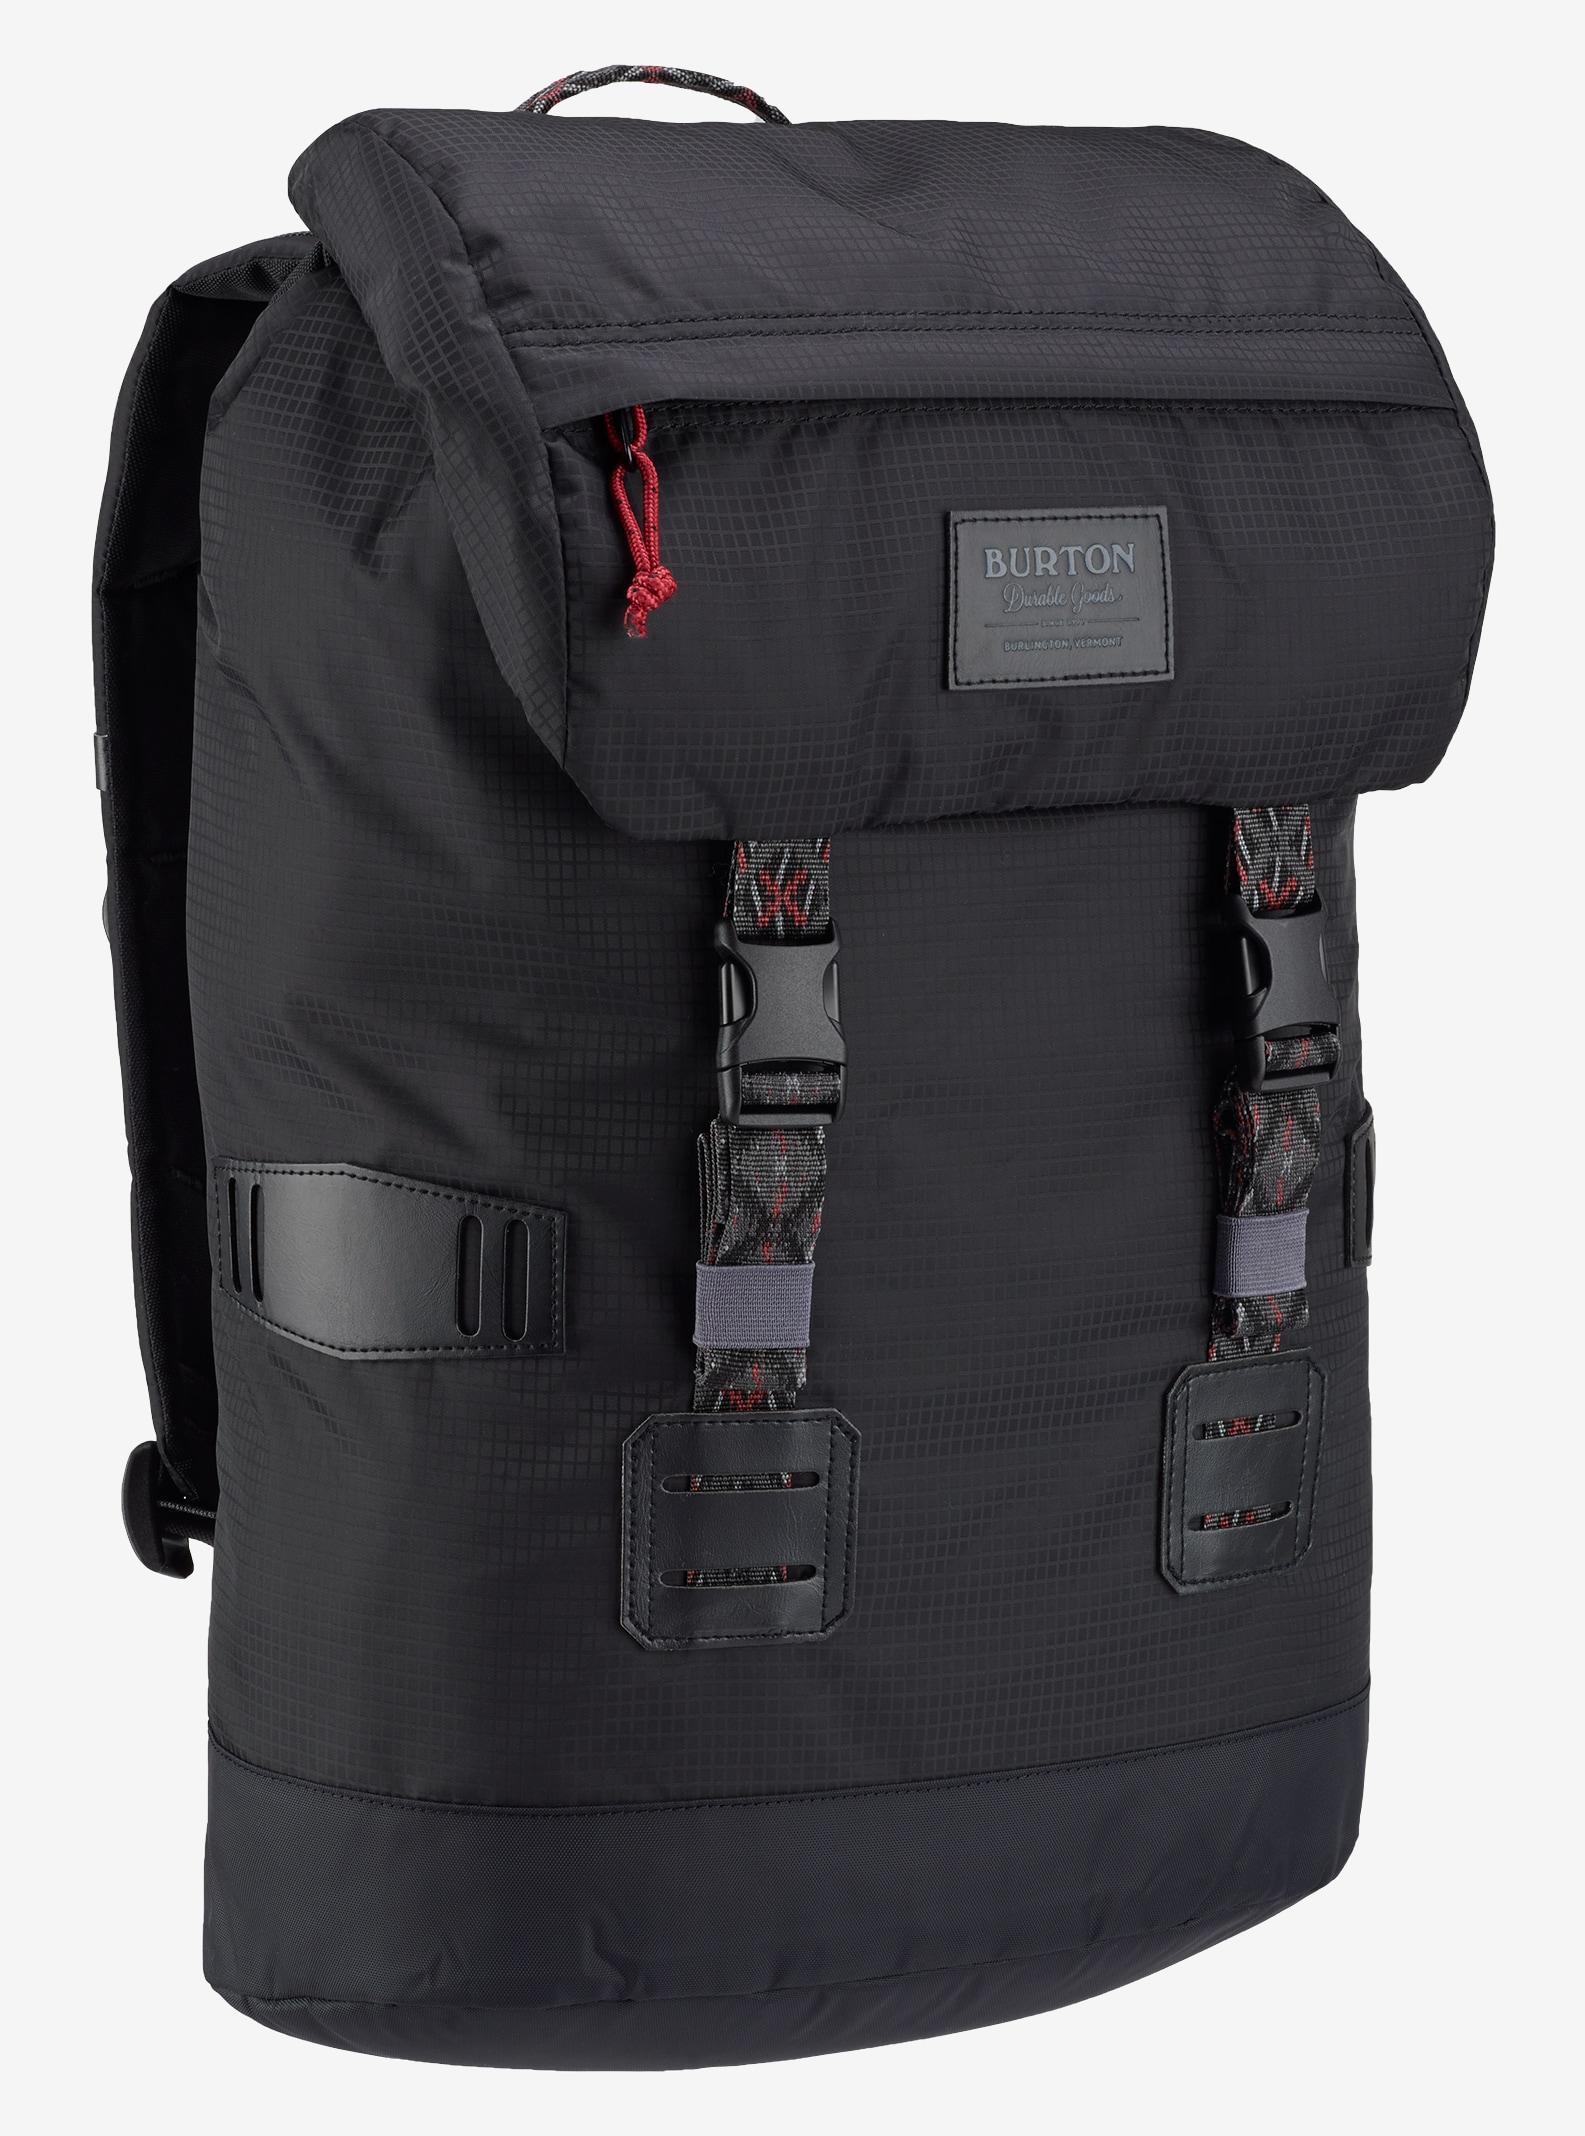 Burton Tinder Backpack shown in True Black Mini Rip